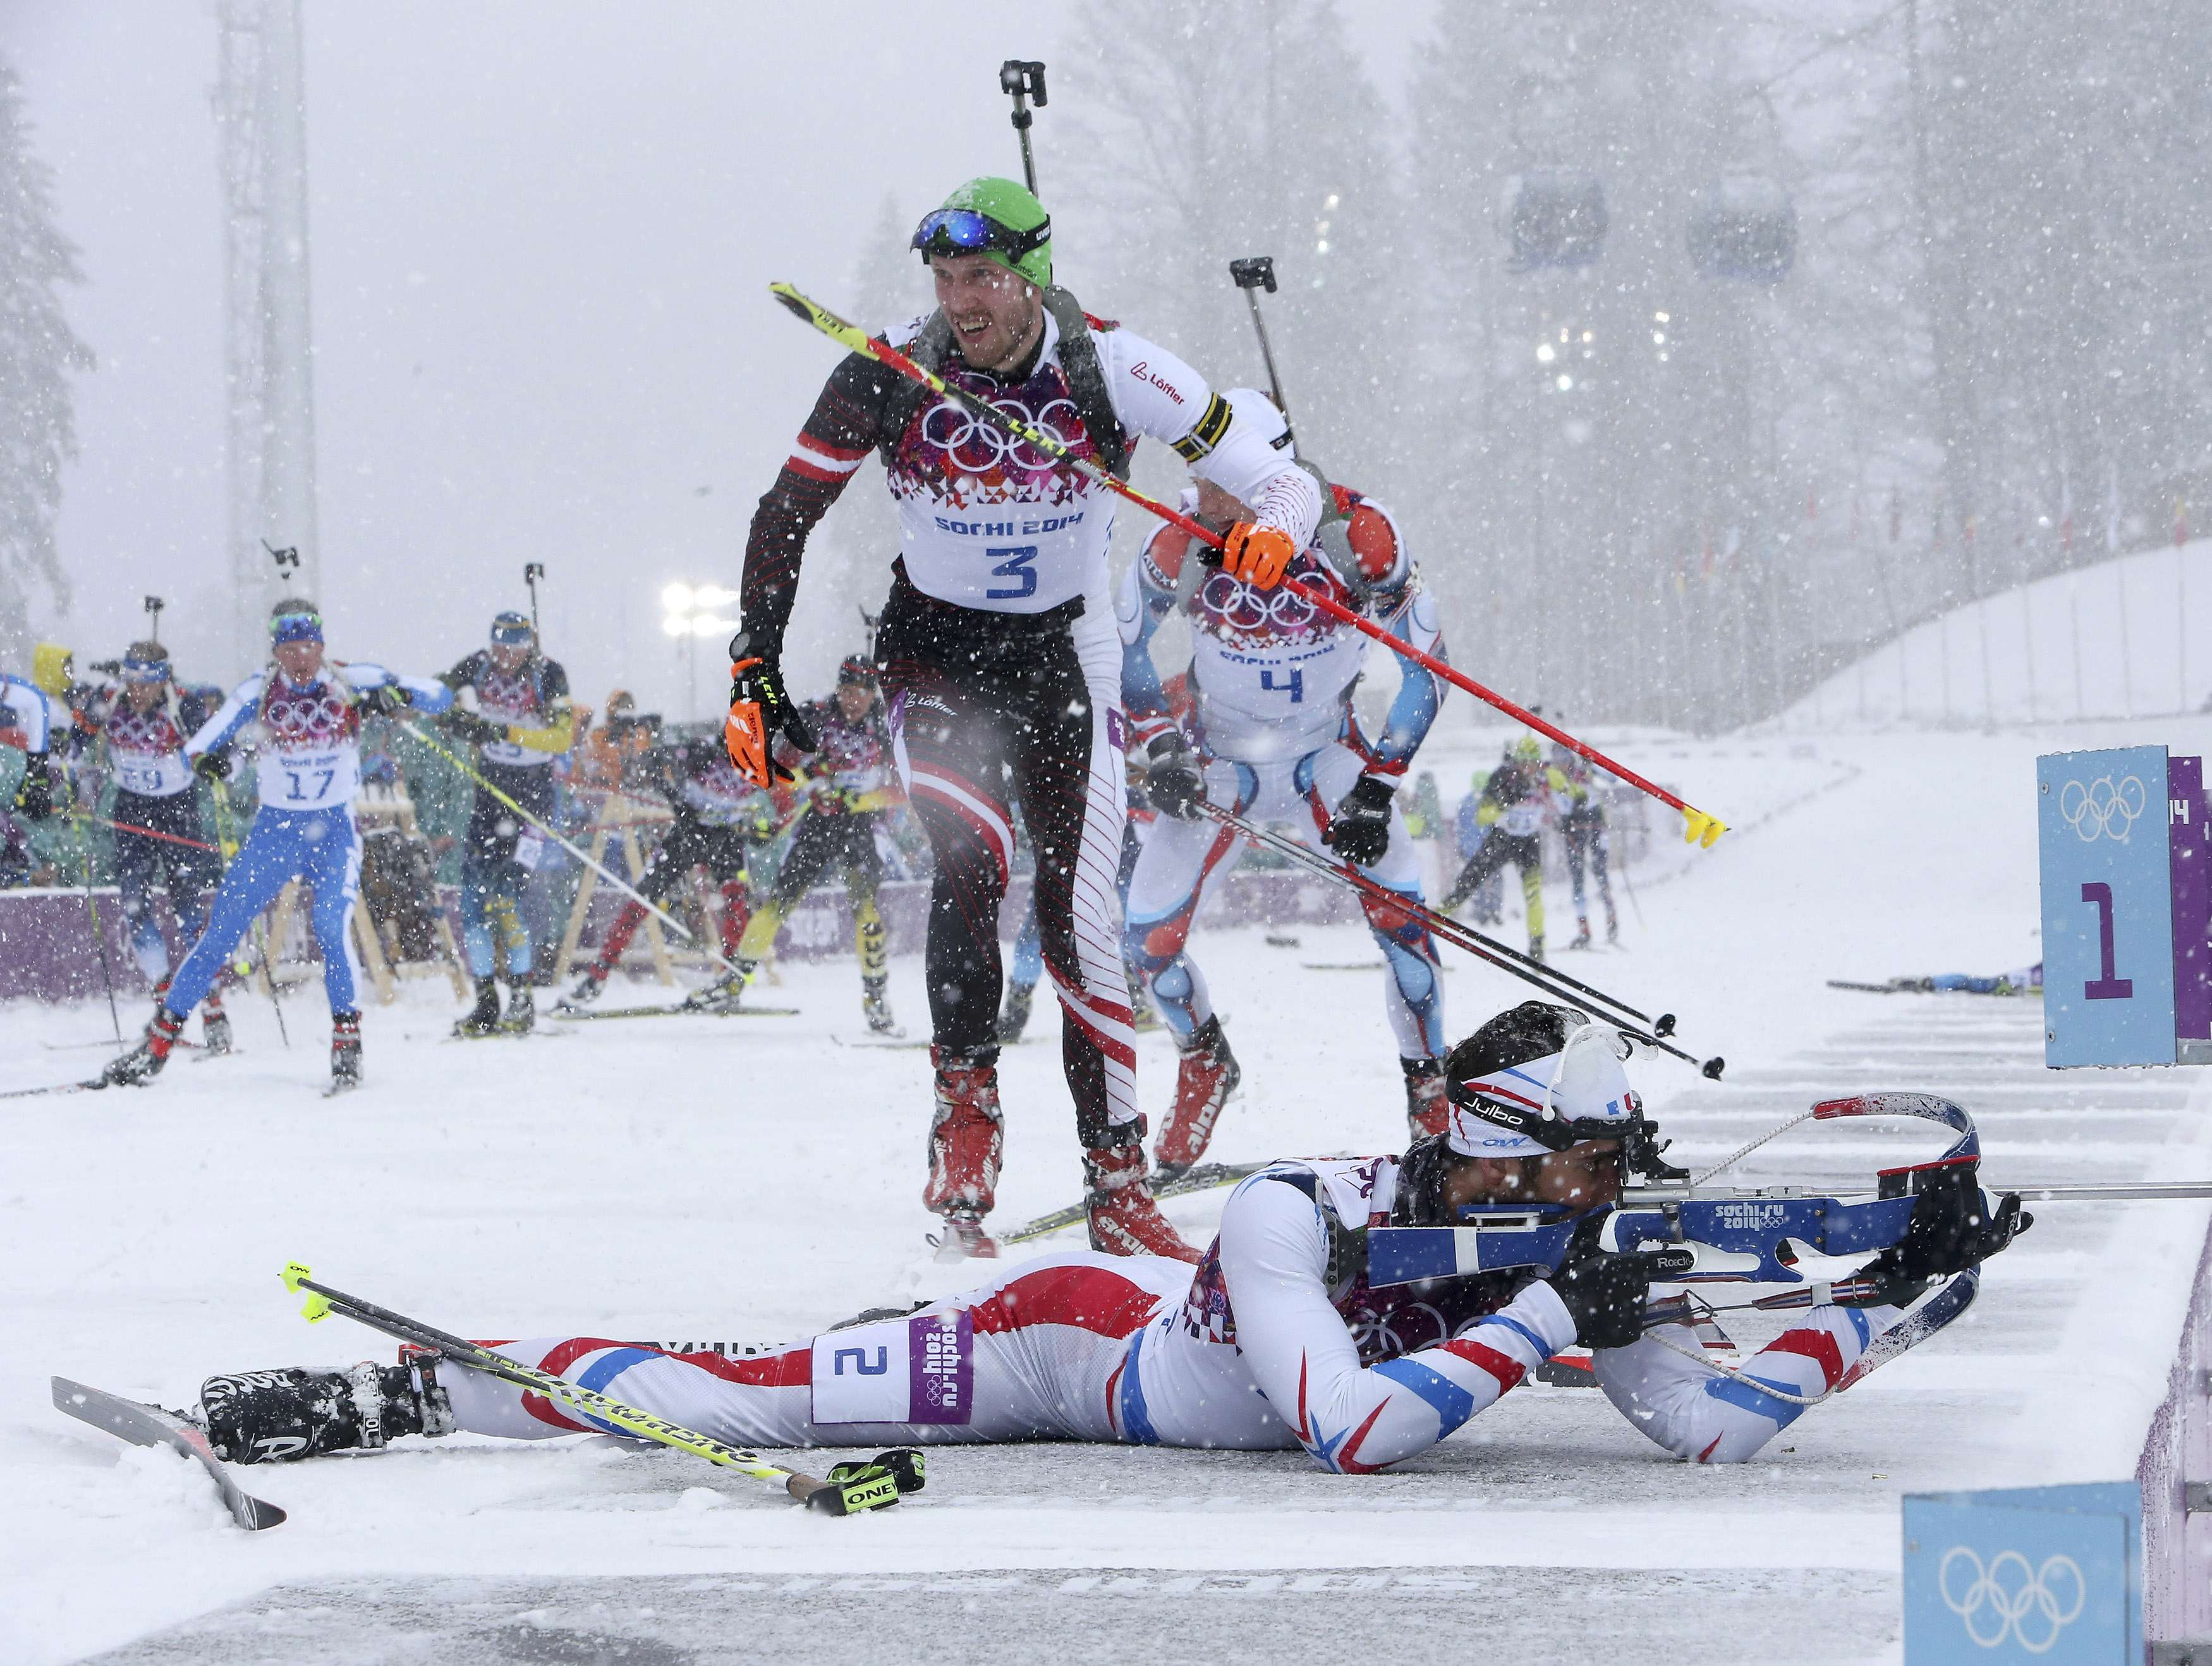 4-biathlon-boring-winter-olympic-events